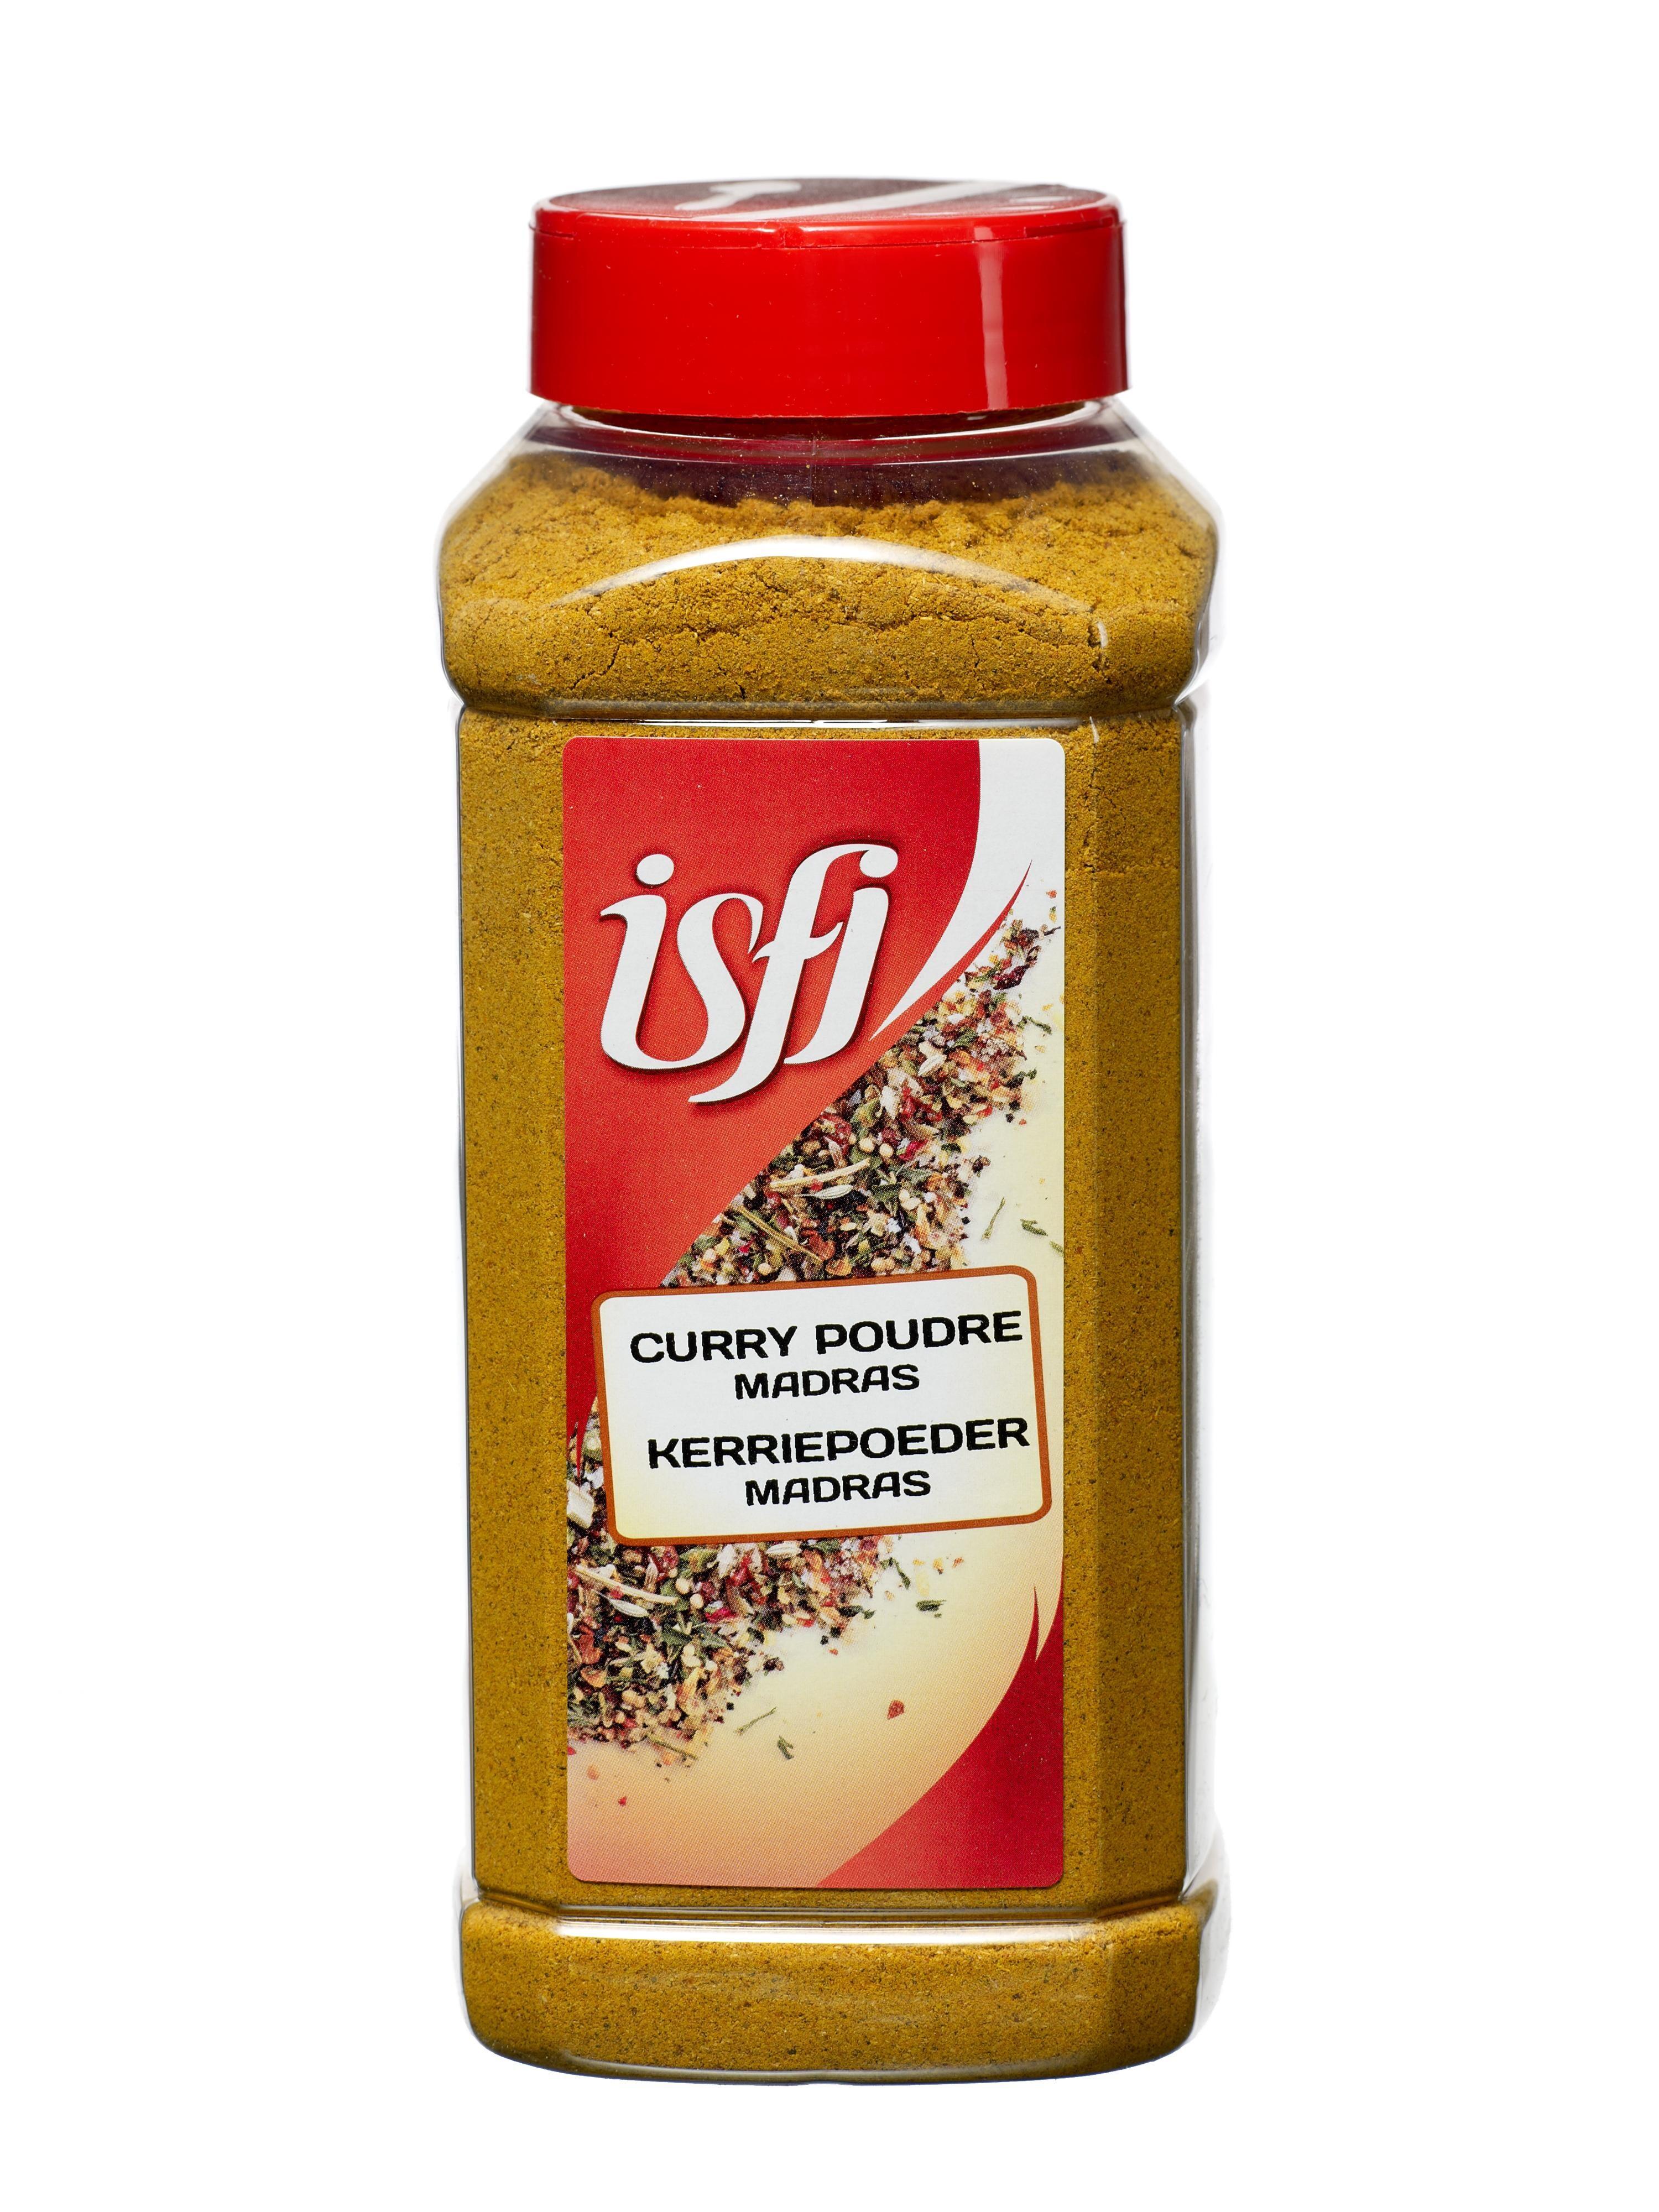 Curry madras powder 450g Pet Jar Isfi